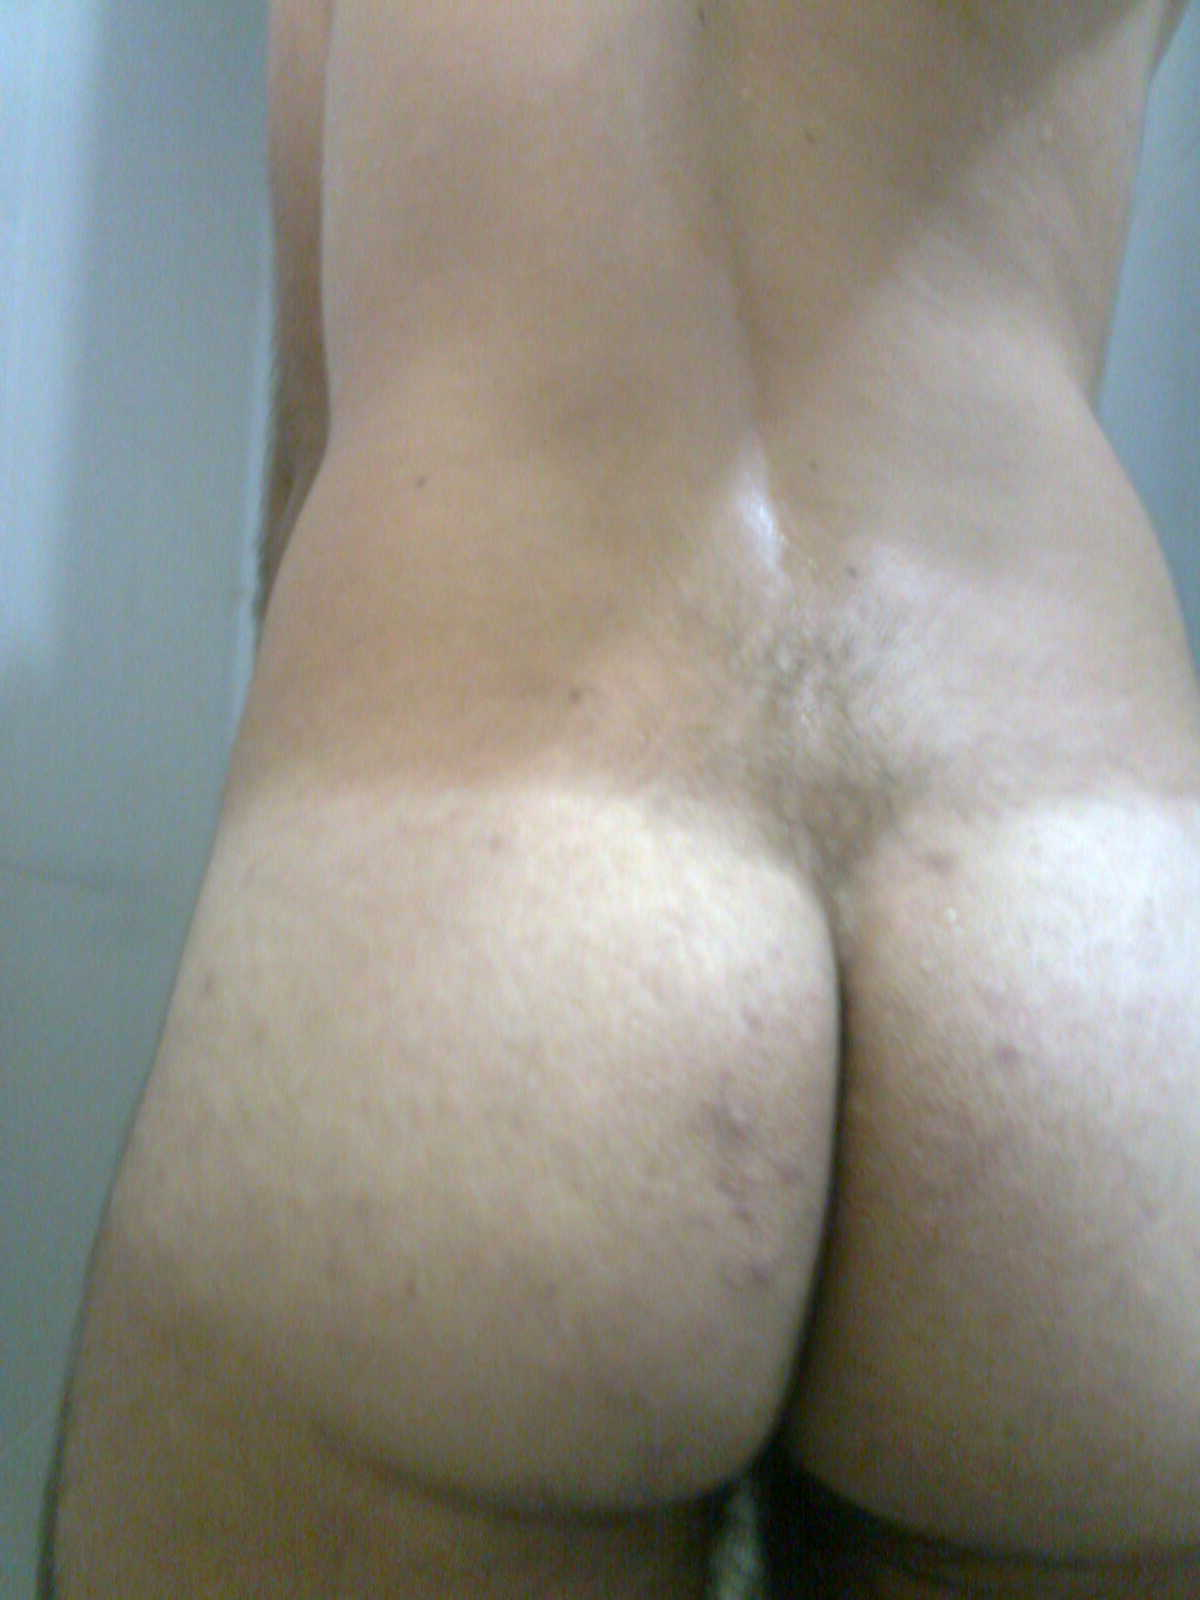 videos caseros desnudos gratis: